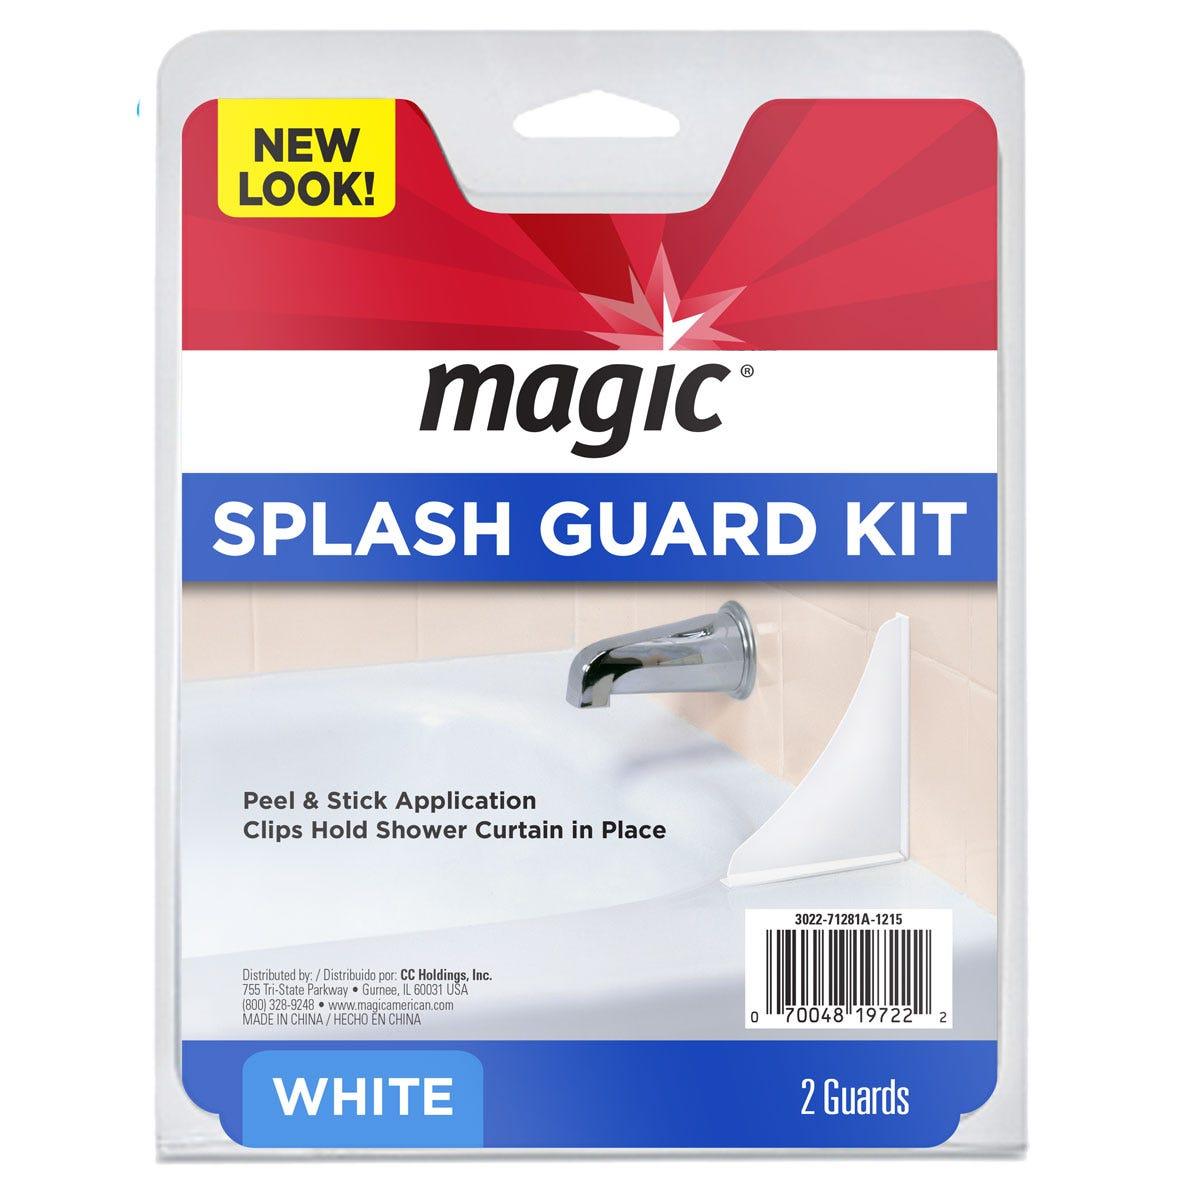 https://googone.com/media/catalog/product/s/p/splash-guard-kit_front.jpg